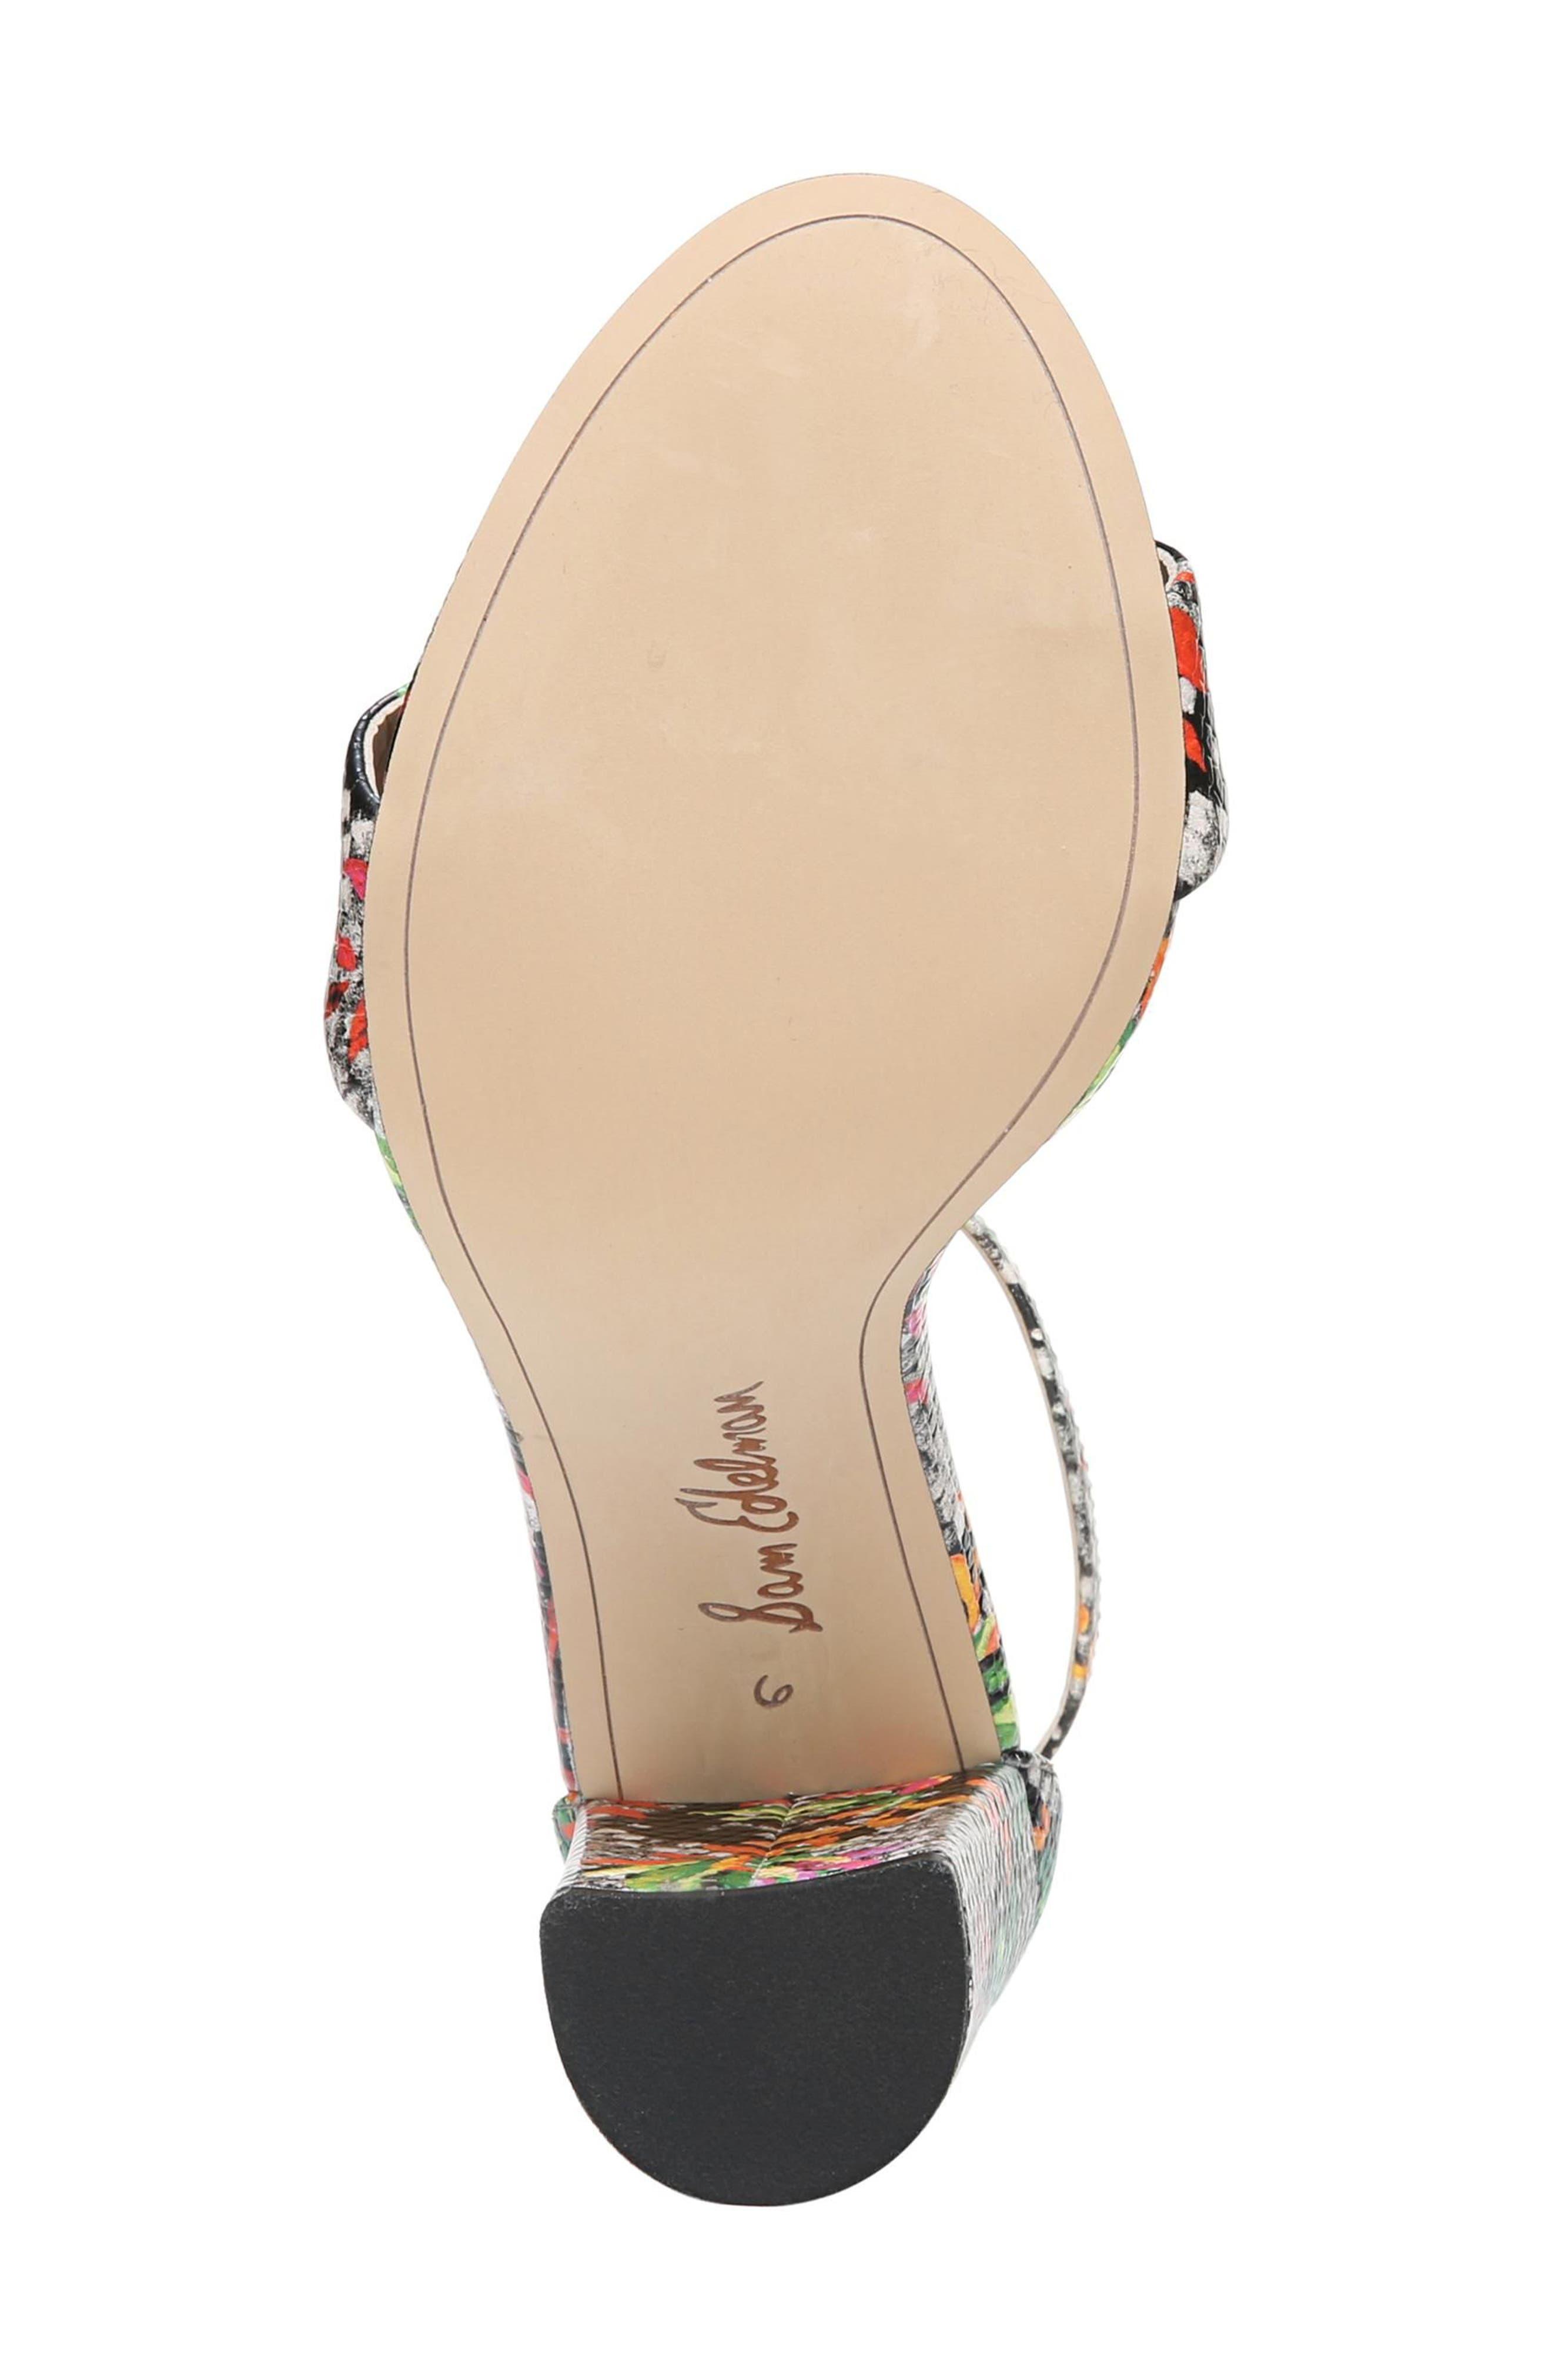 Yaro Ankle Strap Sandal,                             Alternate thumbnail 4, color,                             Bright Multi Print